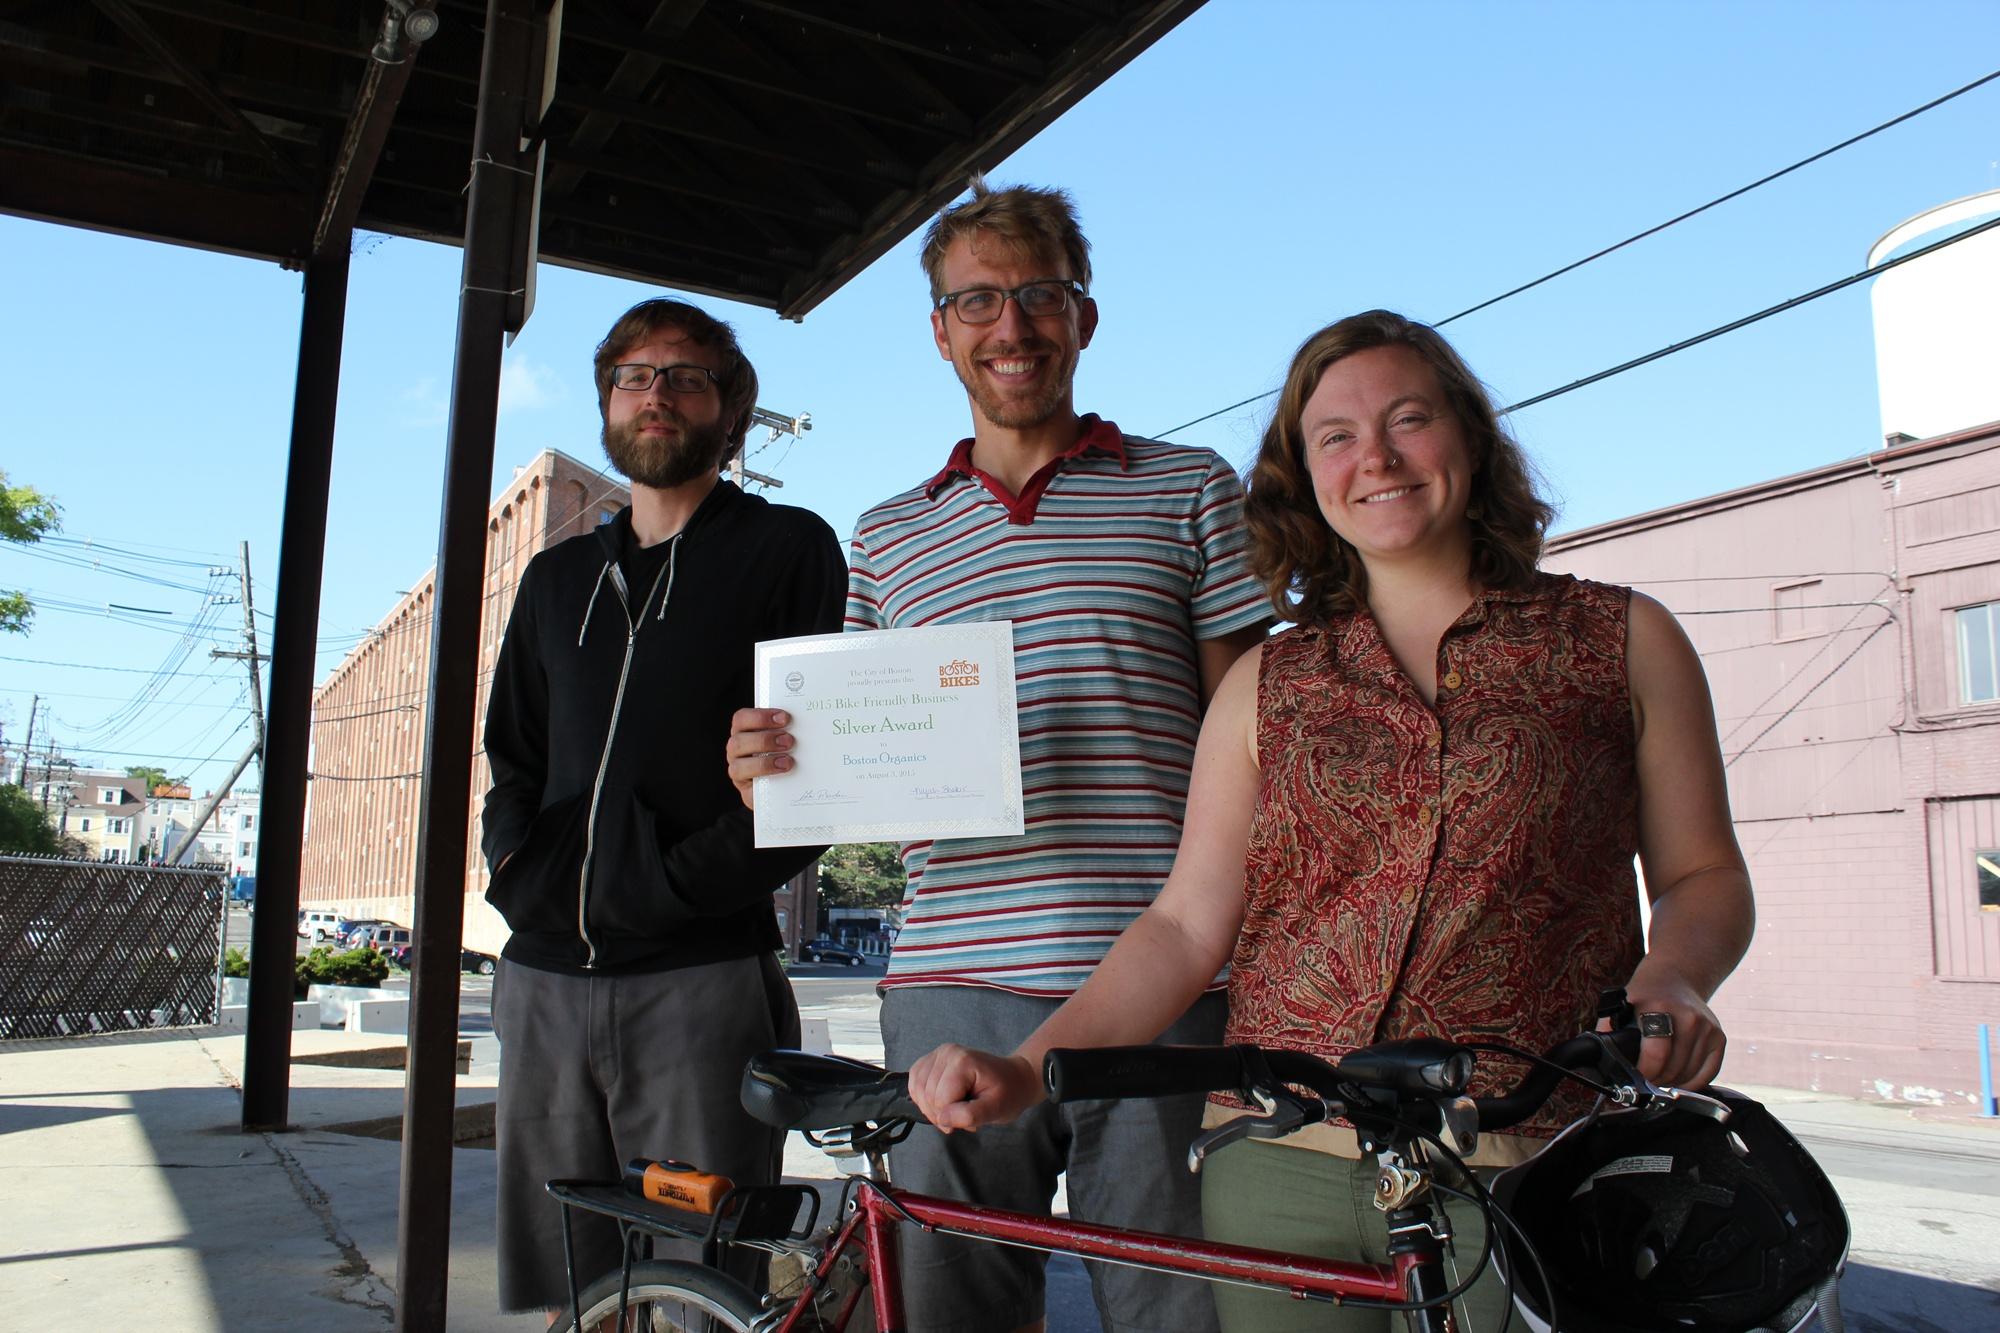 Boston Organics - Bike Friendly Business Award recipient